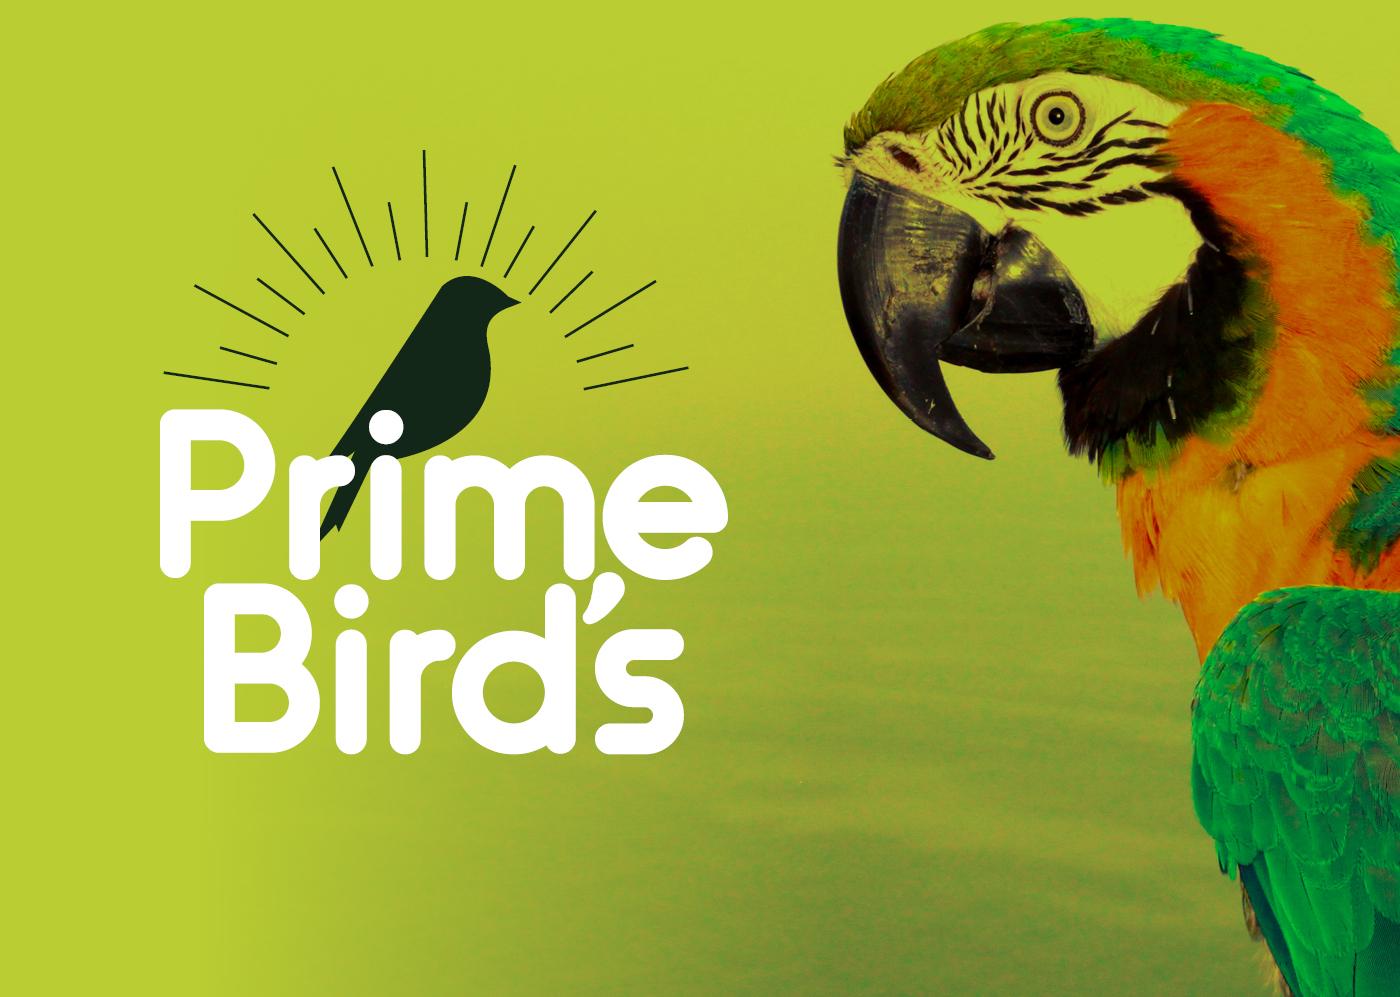 primebirds-logo